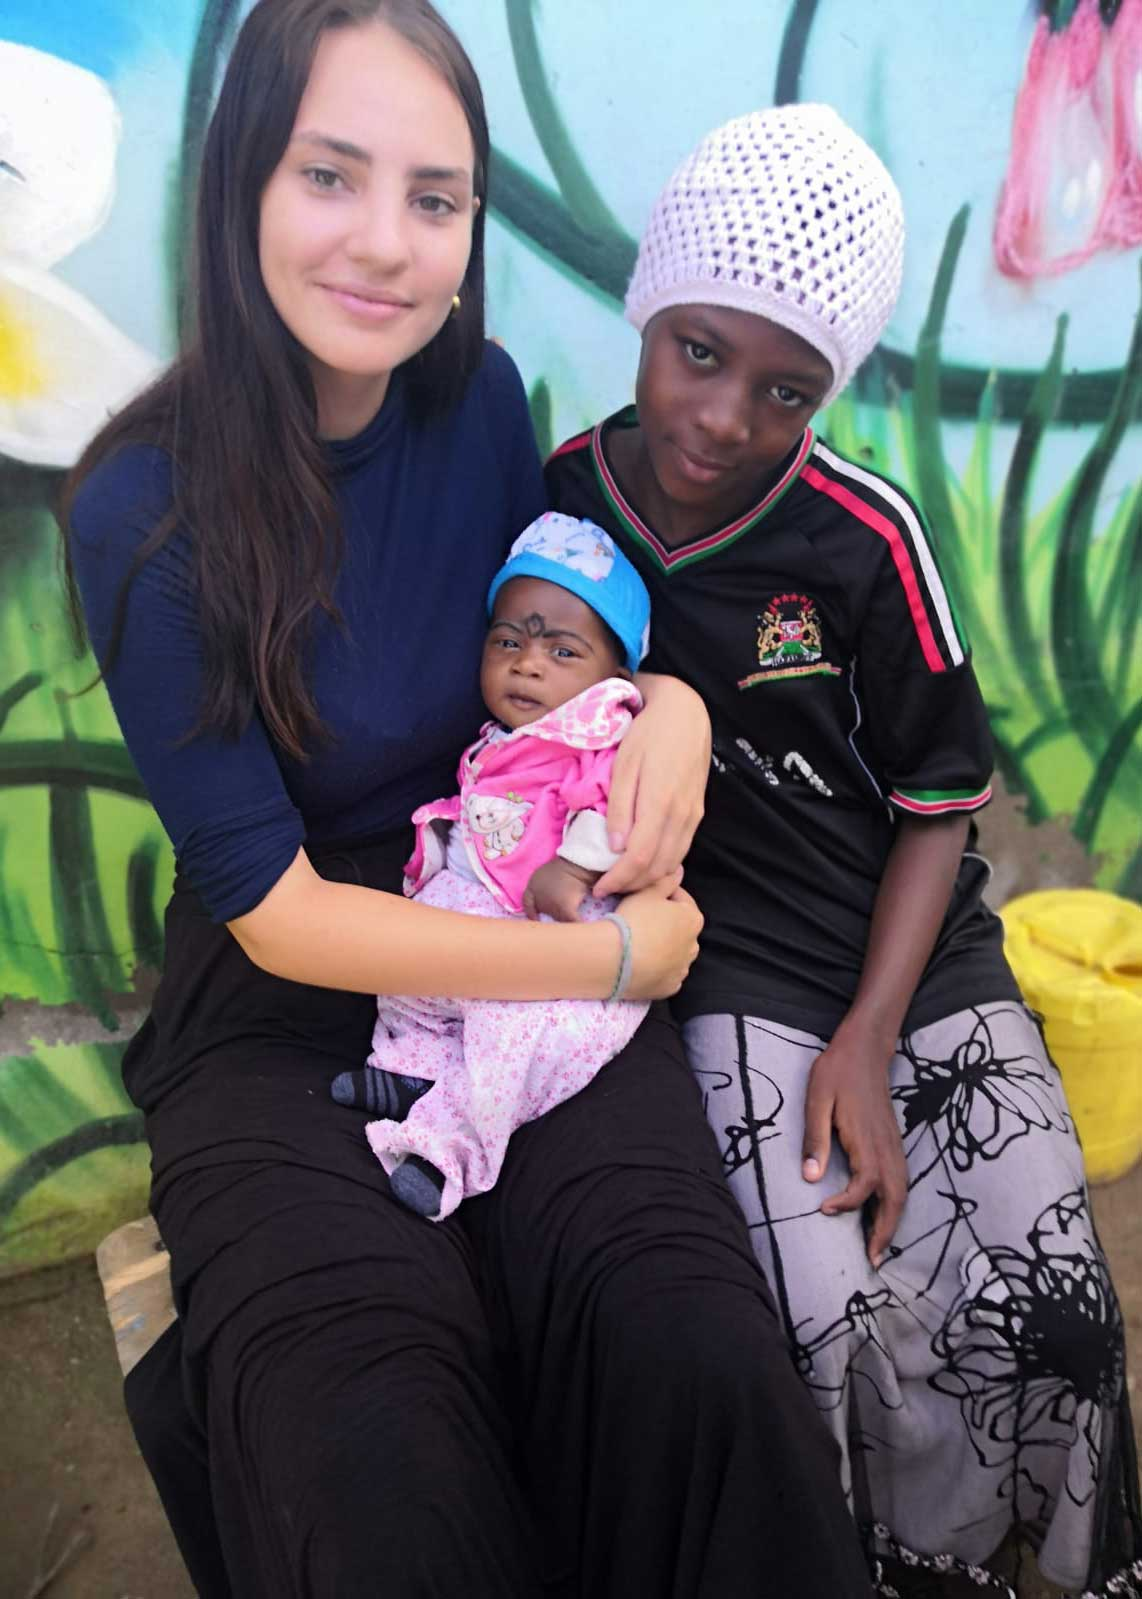 Carla mit zwei Kindern